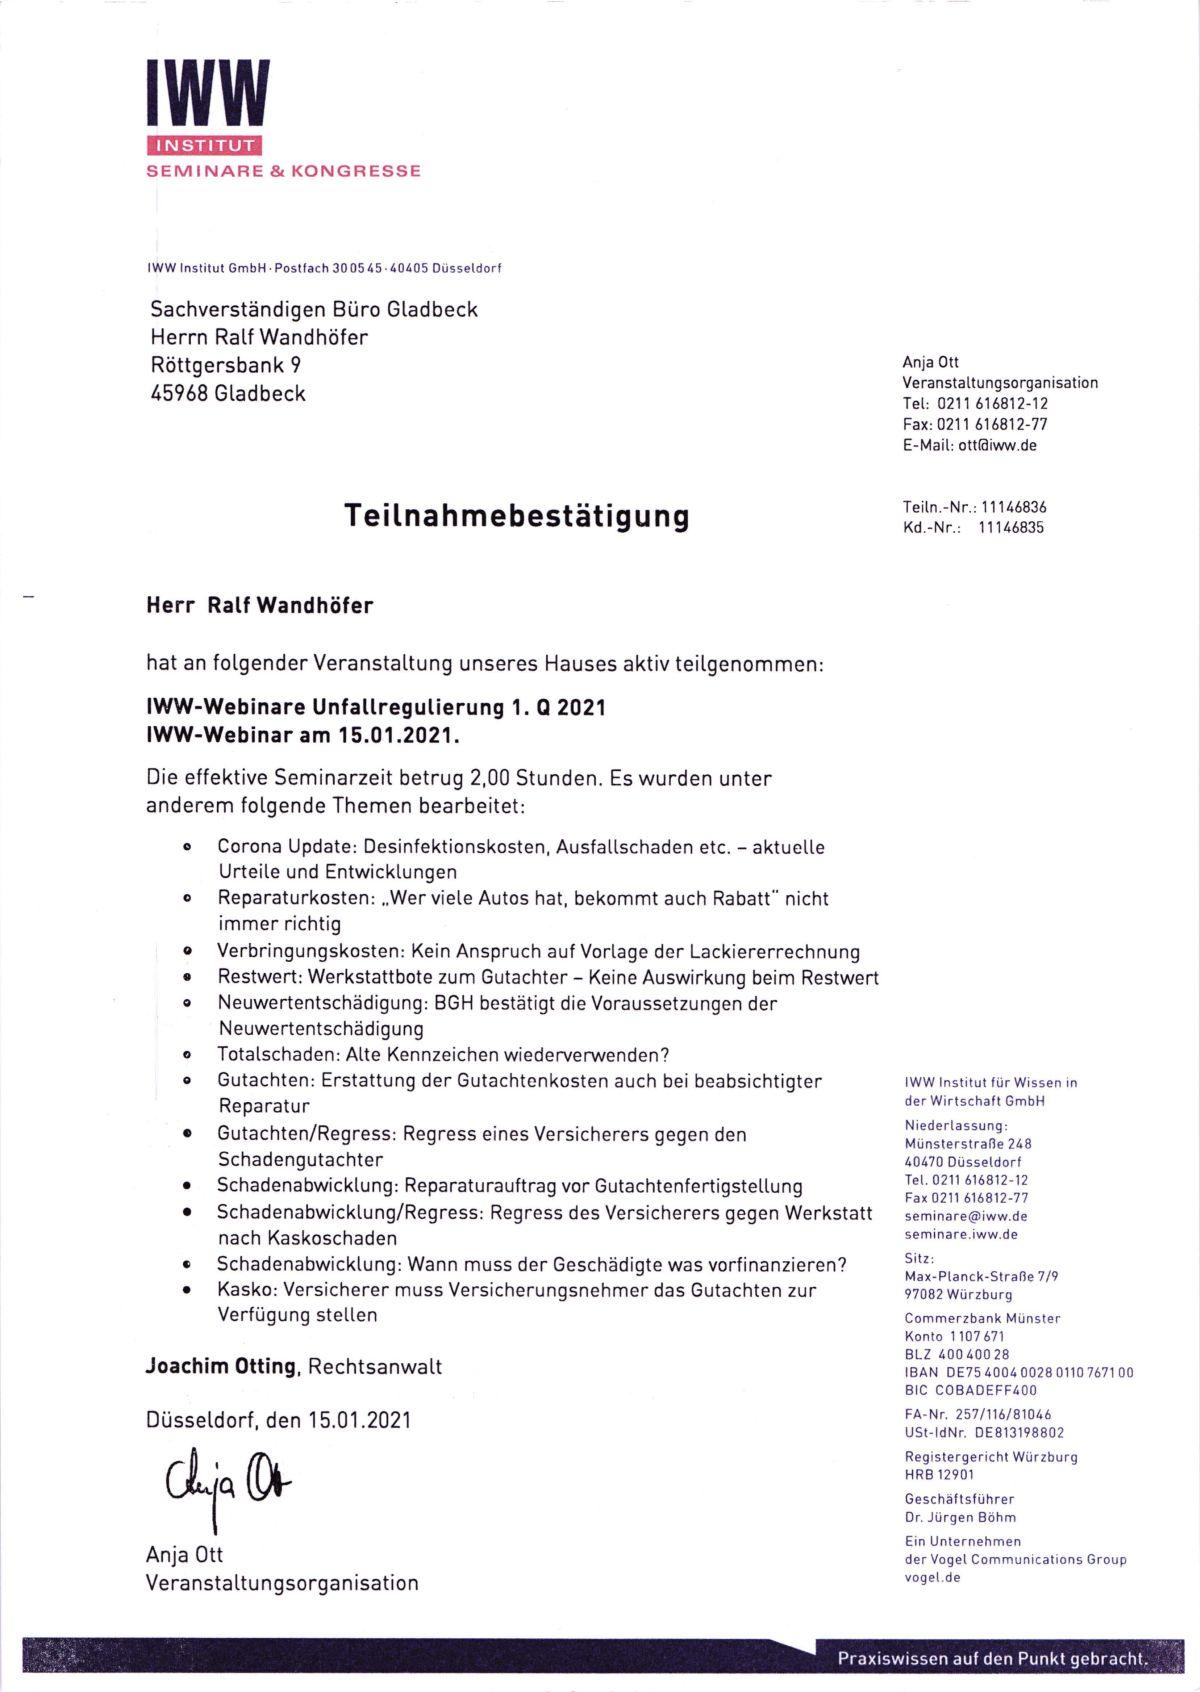 Ralf_Wandhöfer_Zertifikat_001